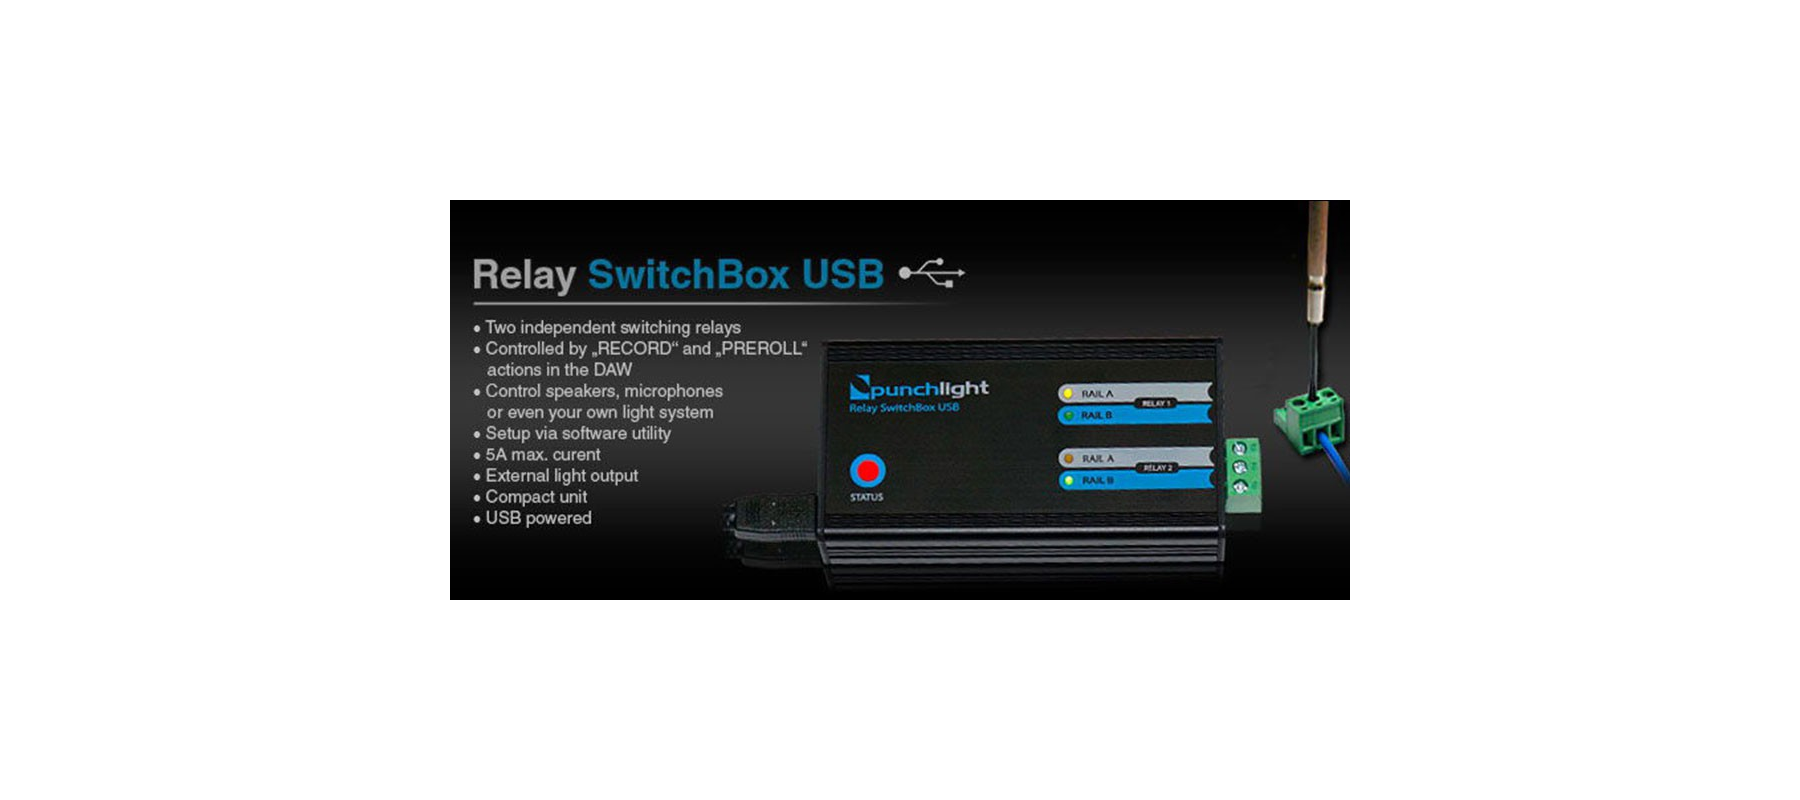 Punchlight Relay Swtchbox USB